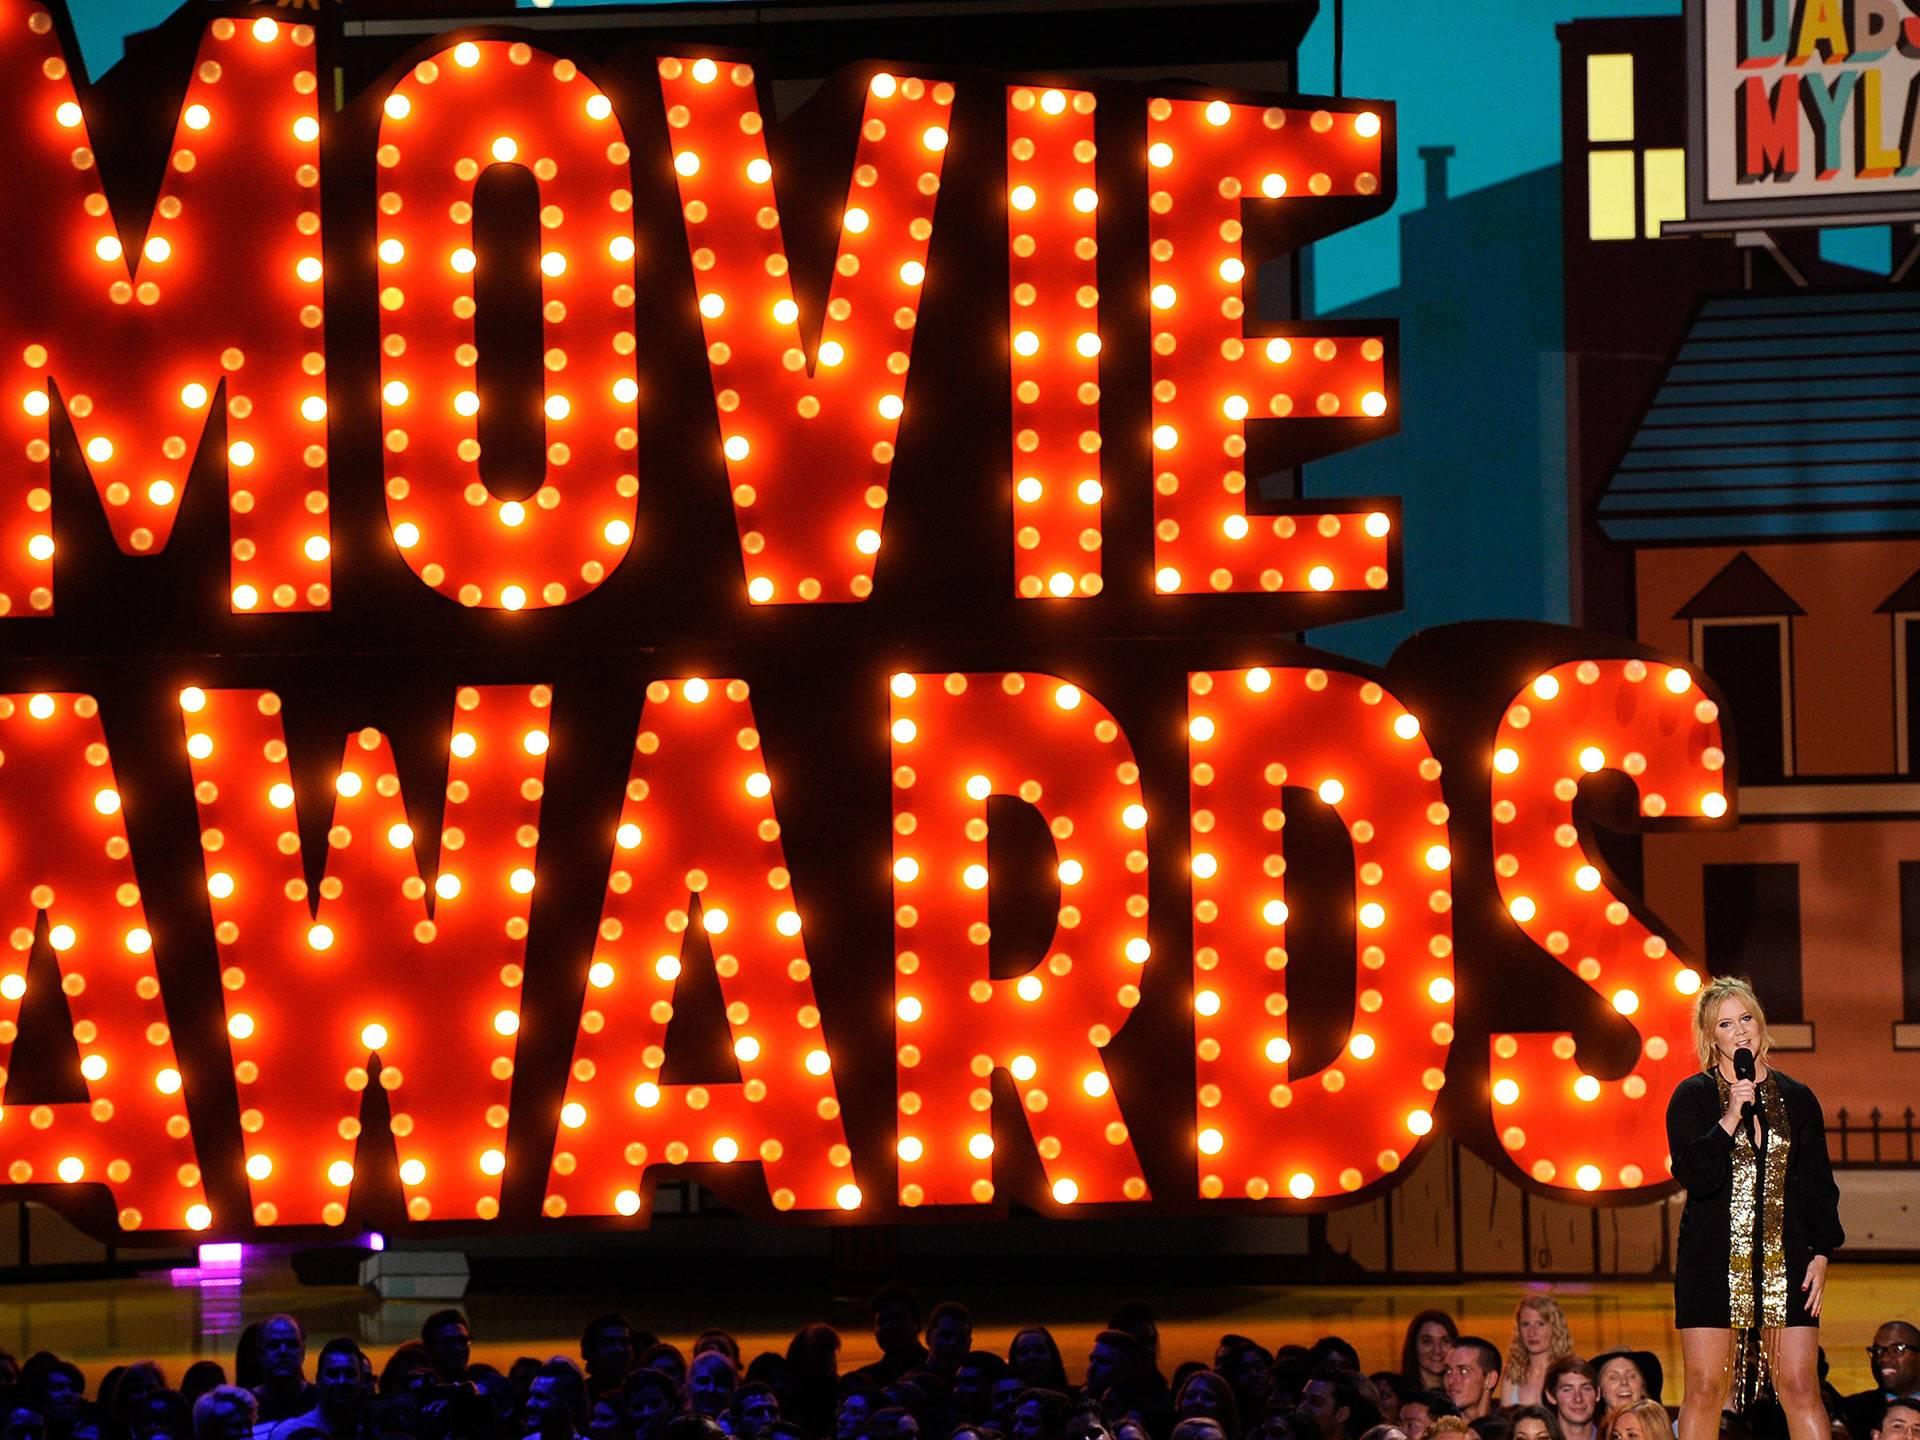 mgid:file:gsp:scenic:/international/mtv-intl/mtv-movie-awards-2015/images/469515810.jpg